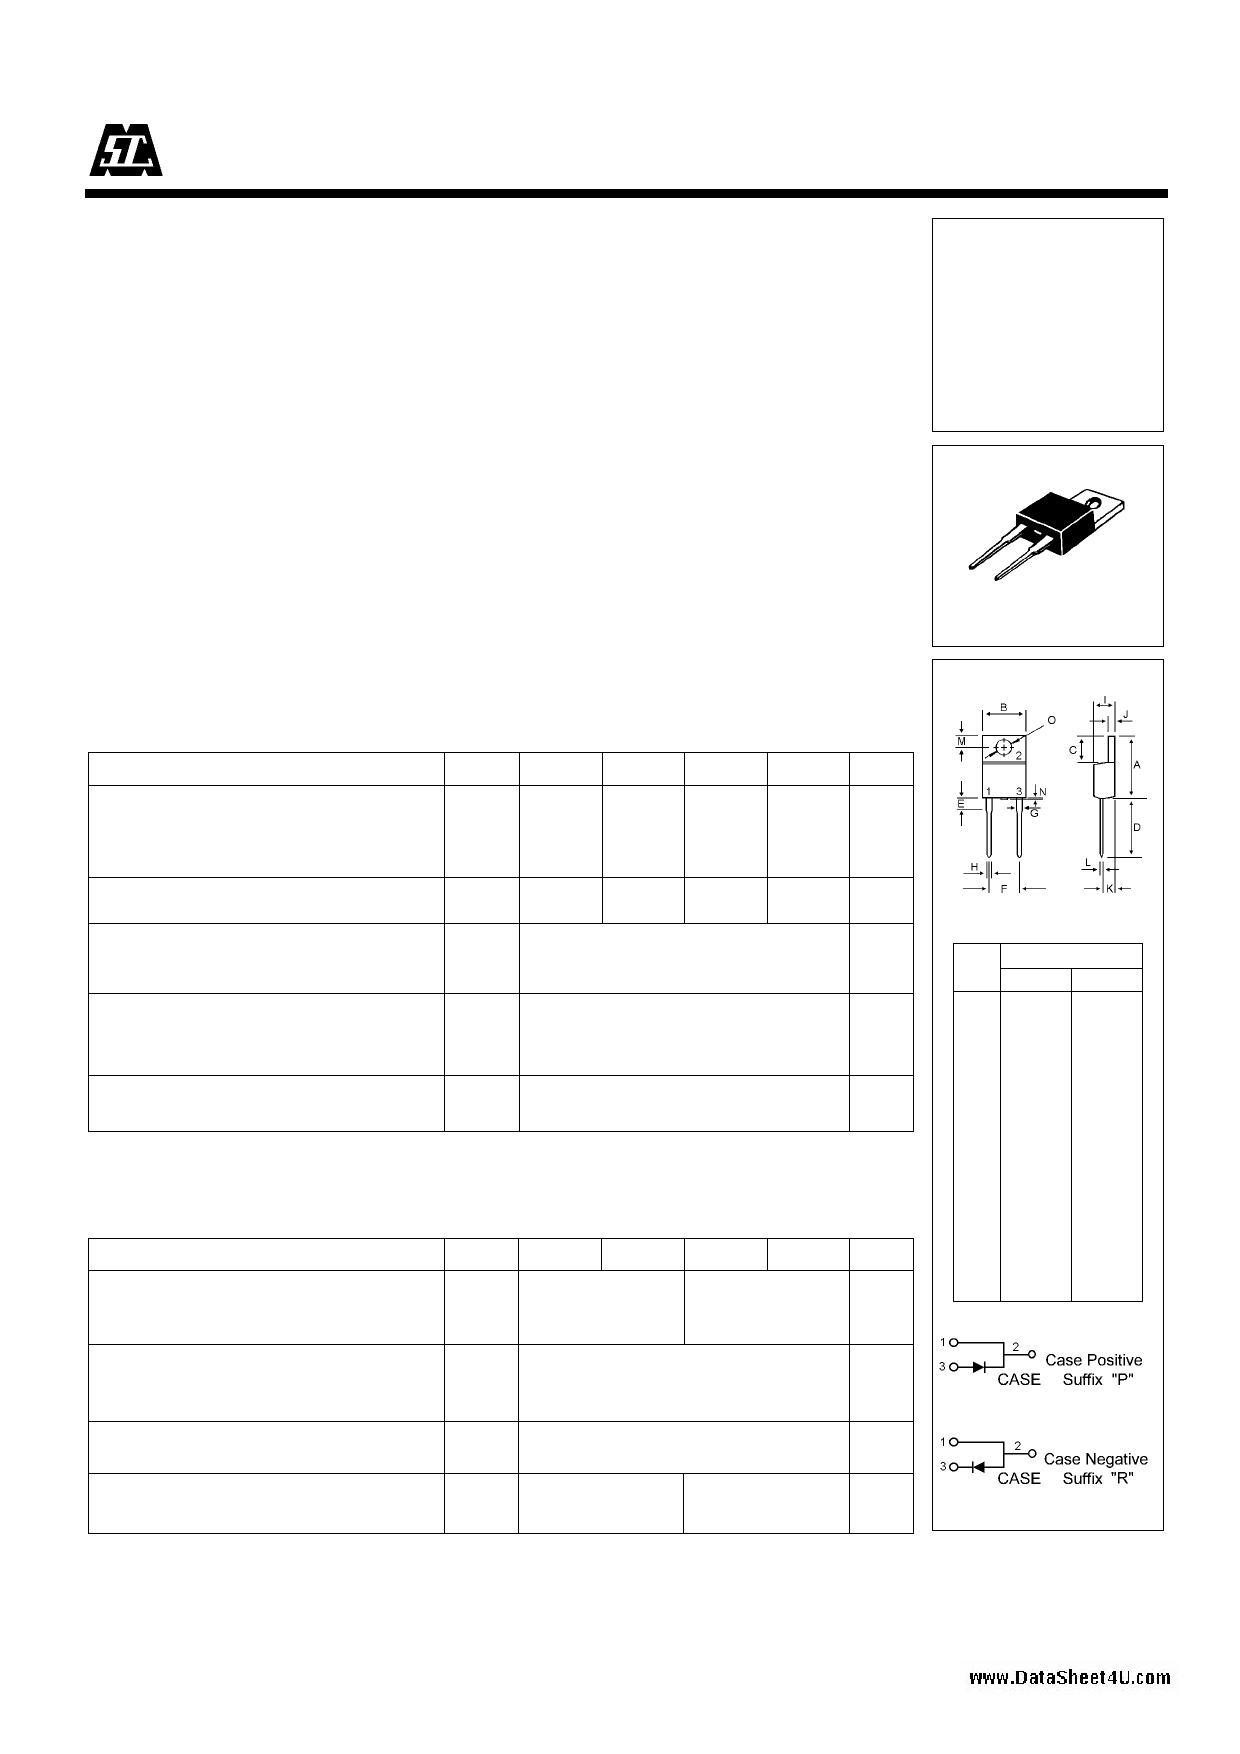 U05A60 даташит PDF